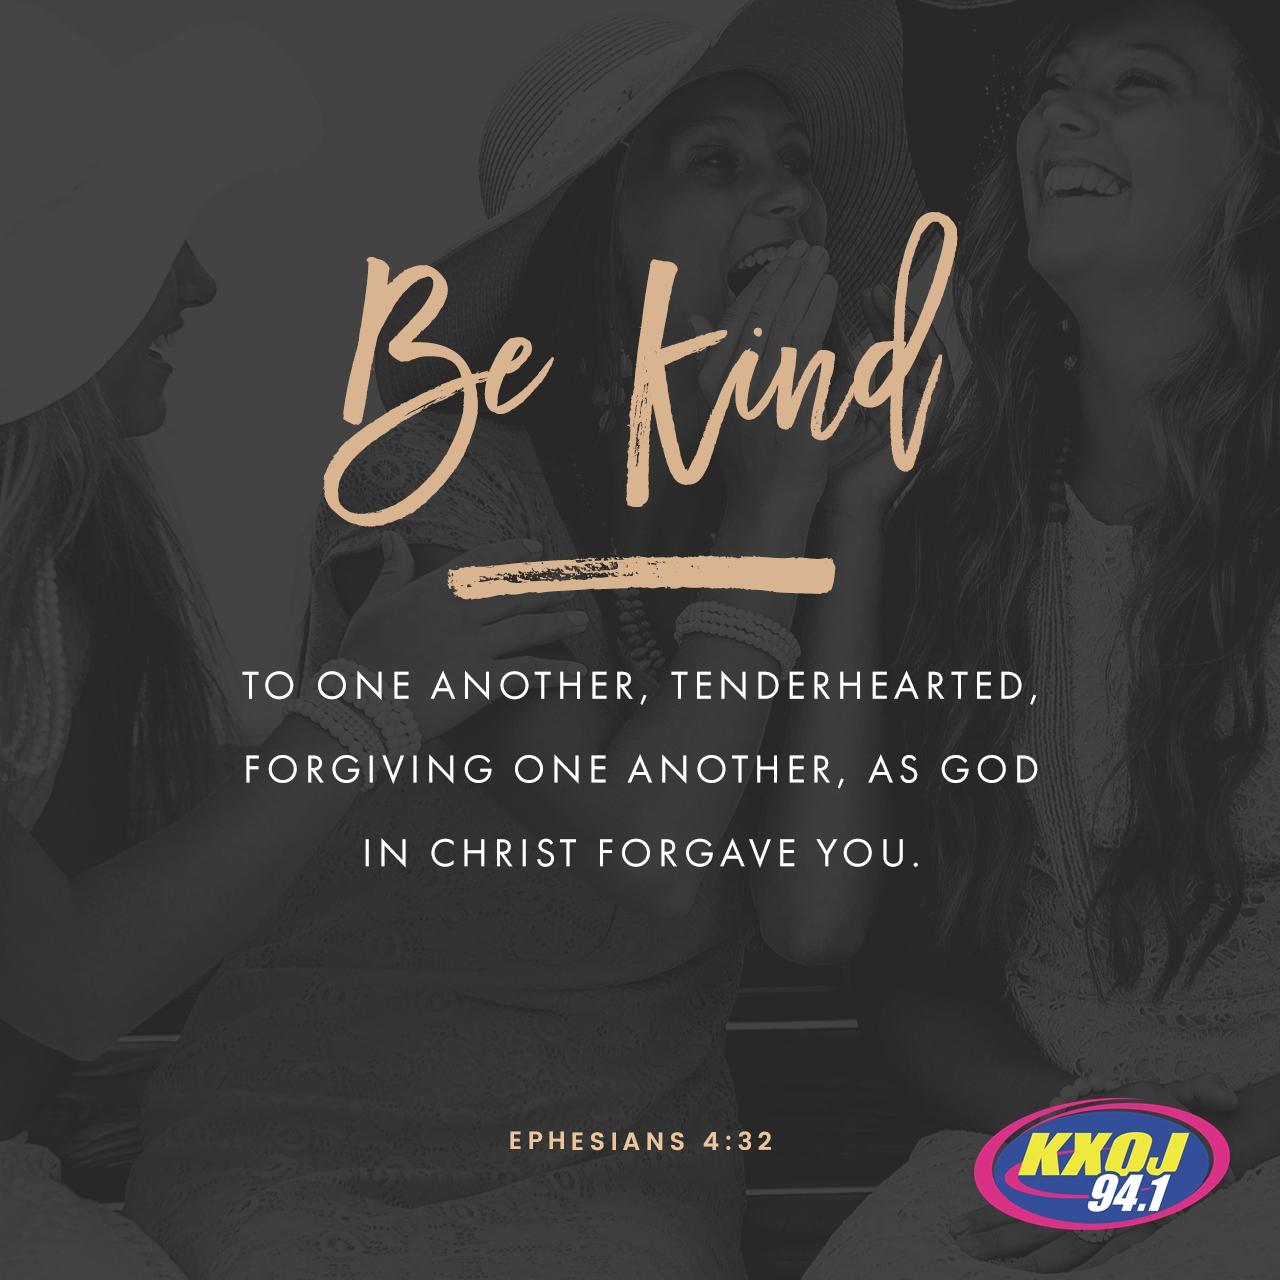 August 5th - Ephesians 4:32